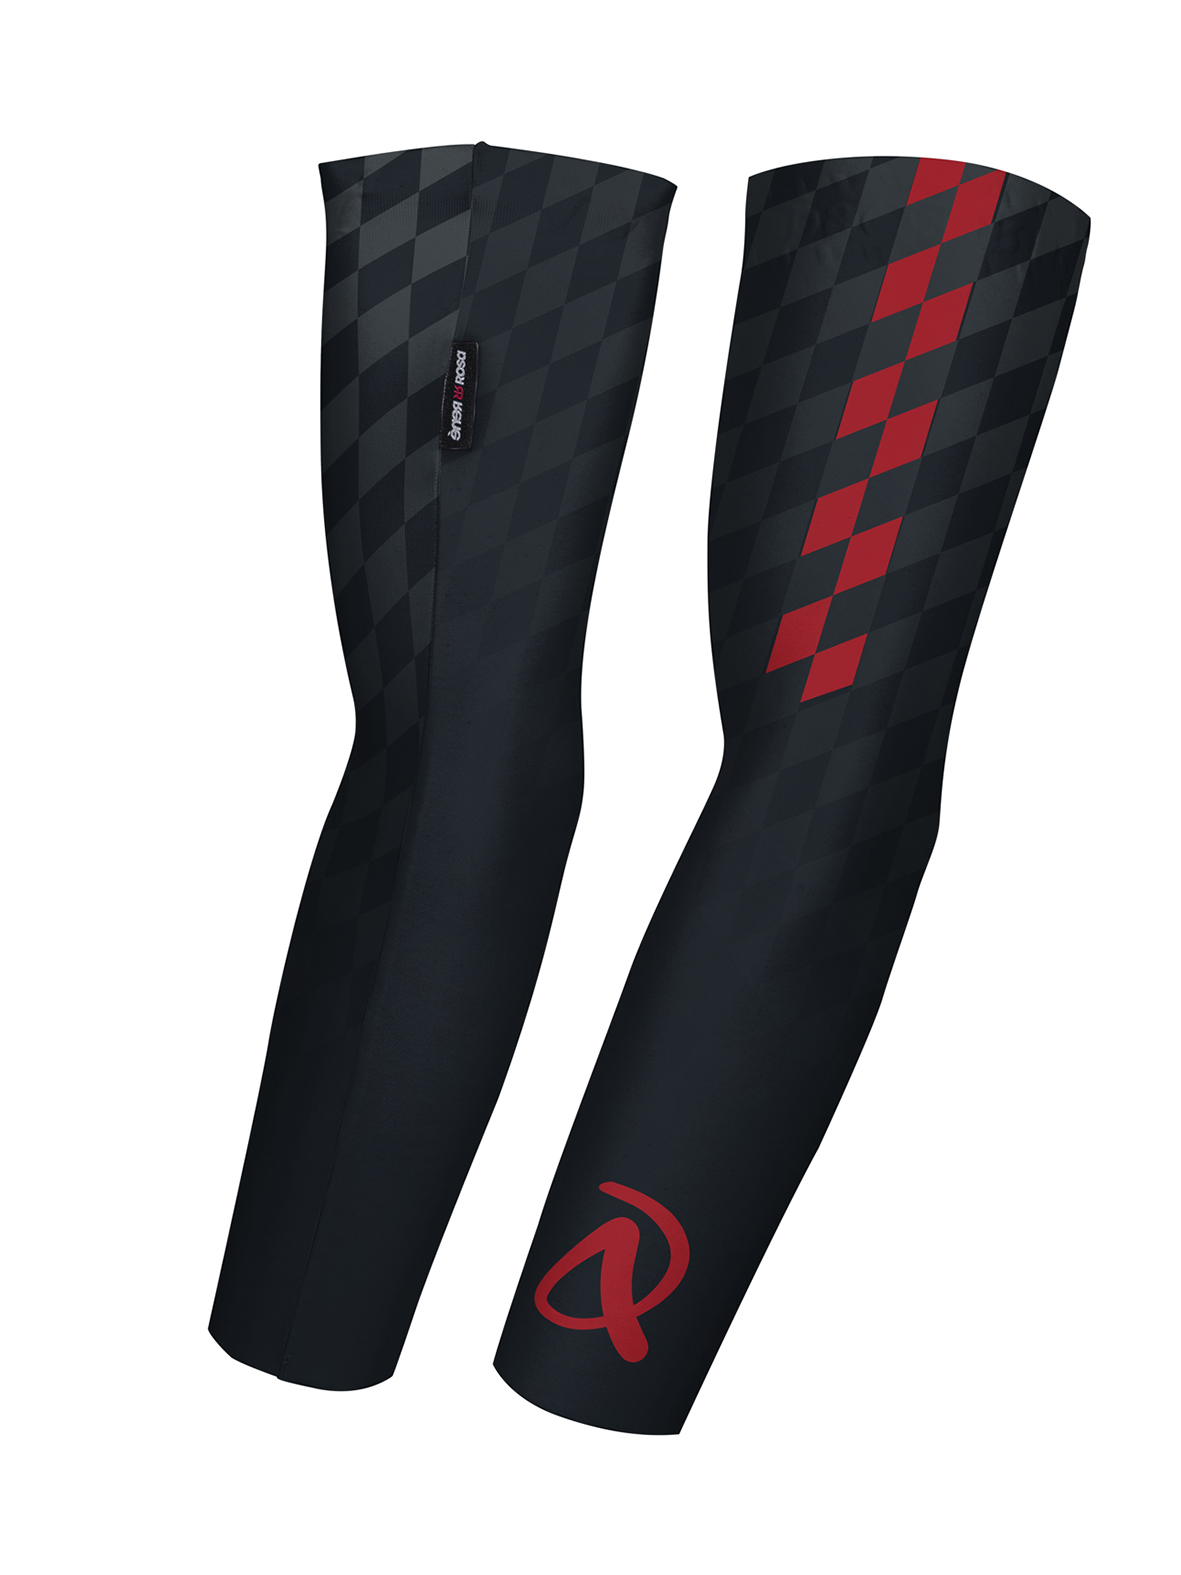 Armlinge RRT1940U / schwarz - rot / Andi Dreitz